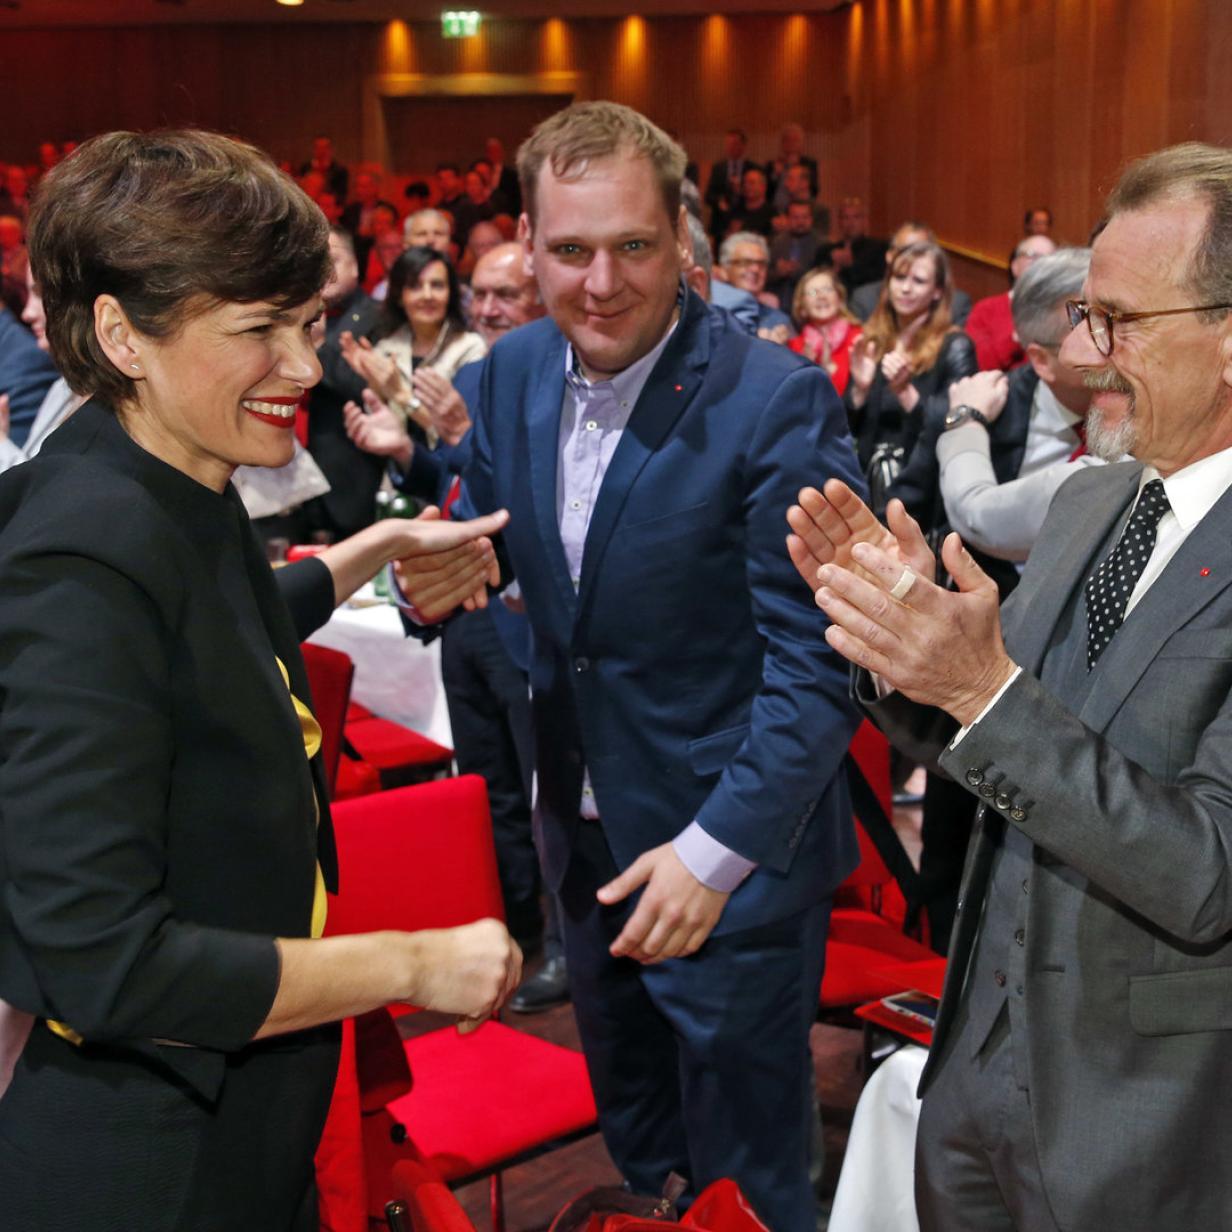 NR-Wahl: Philip Kucher führt SPÖ-Liste in Kärnten an